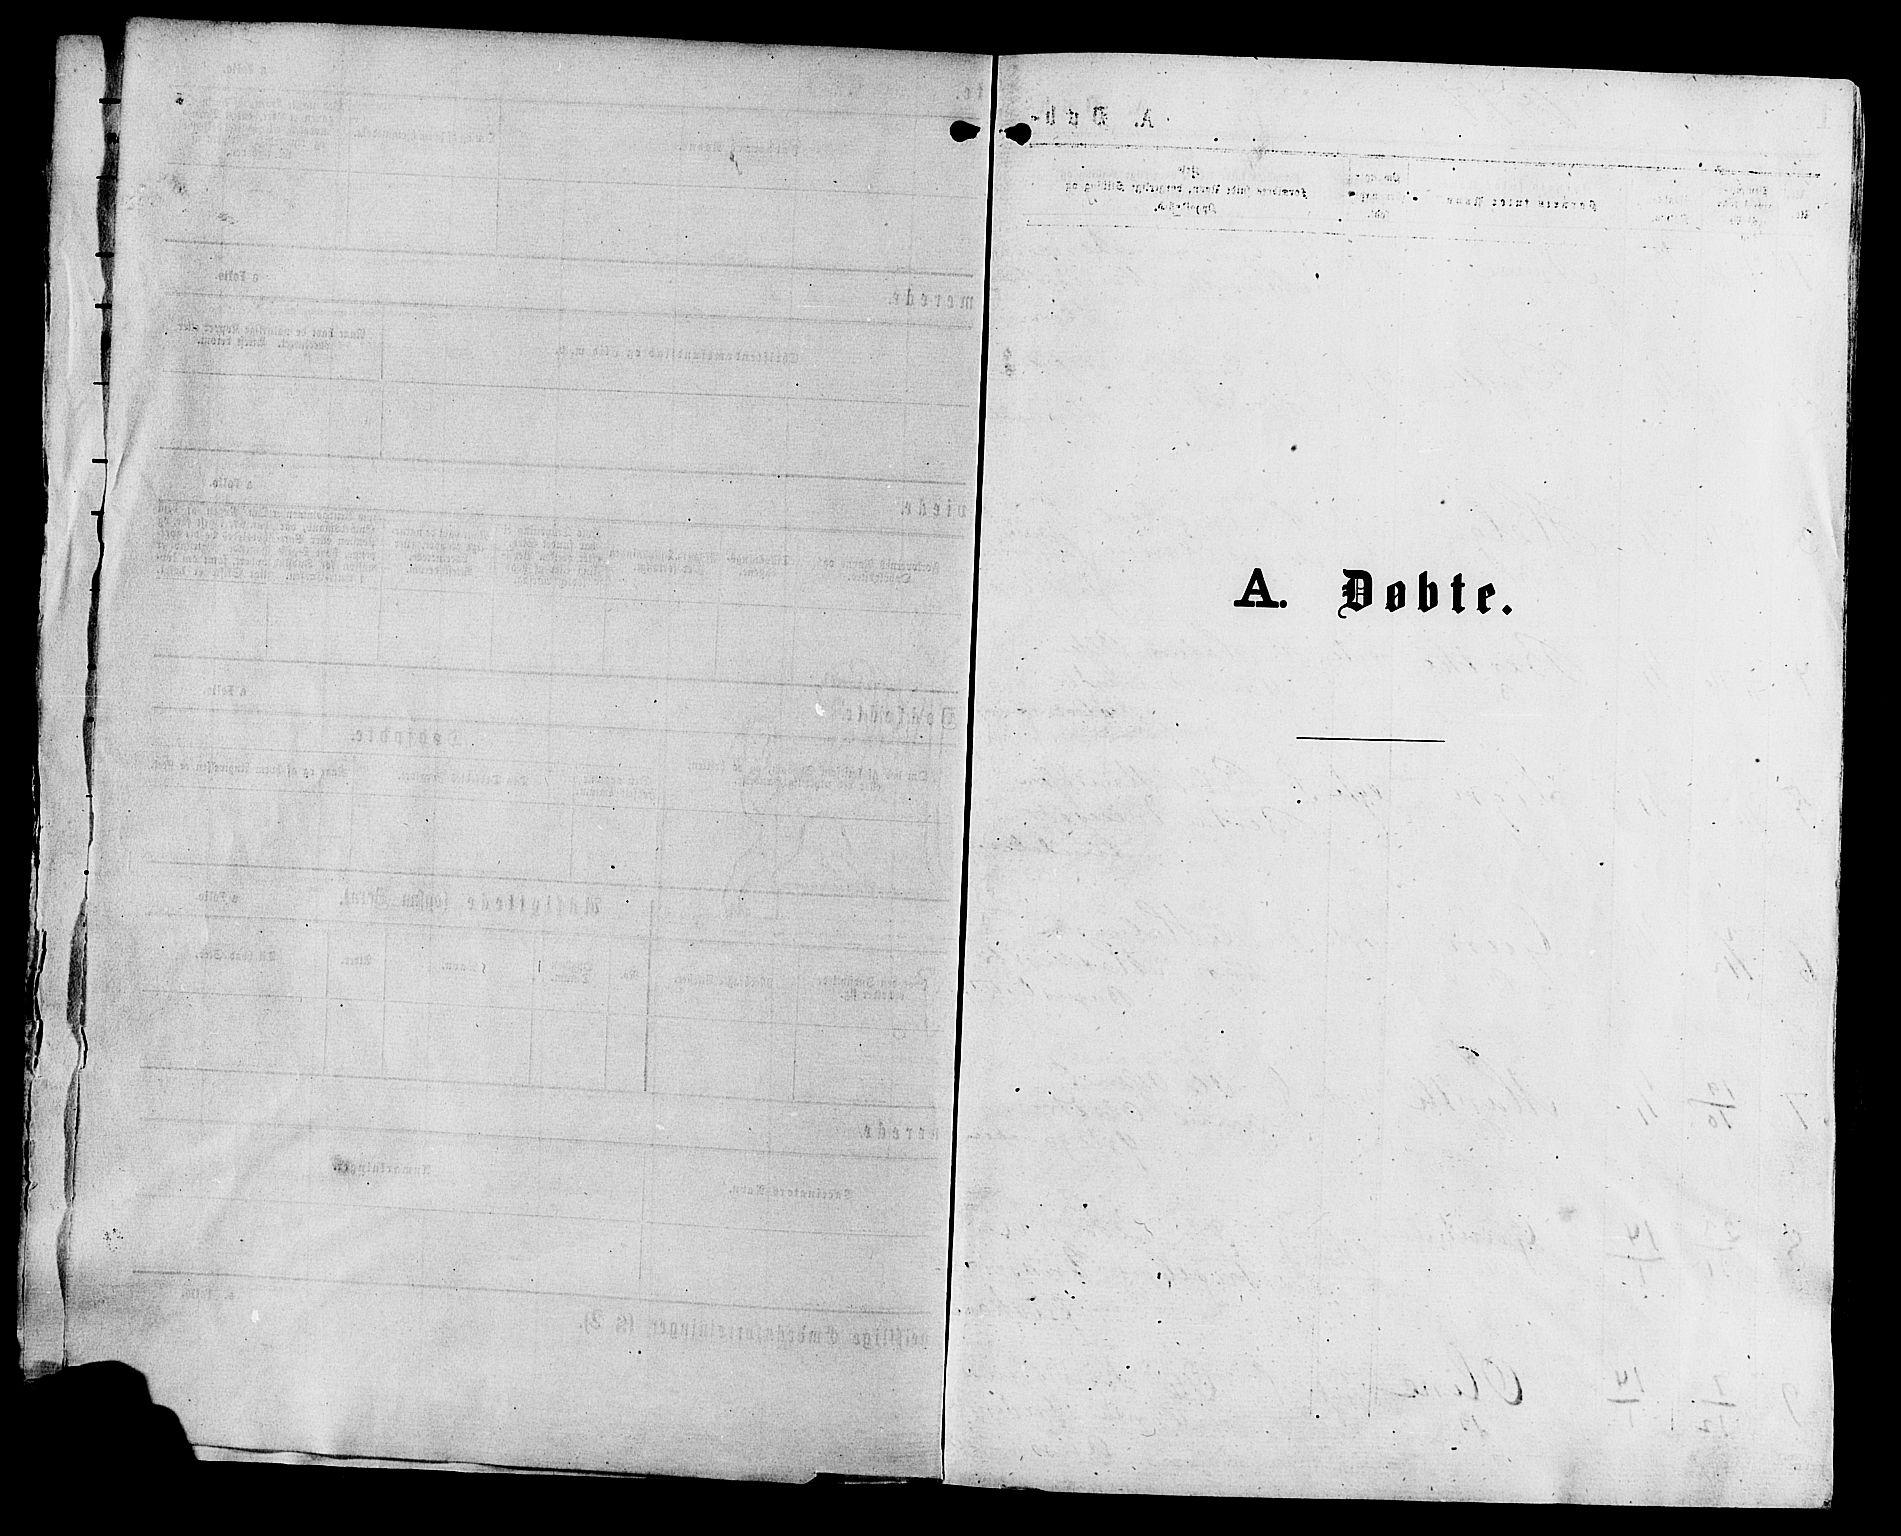 SAH, Sør-Aurdal prestekontor, Ministerialbok nr. 8, 1877-1885